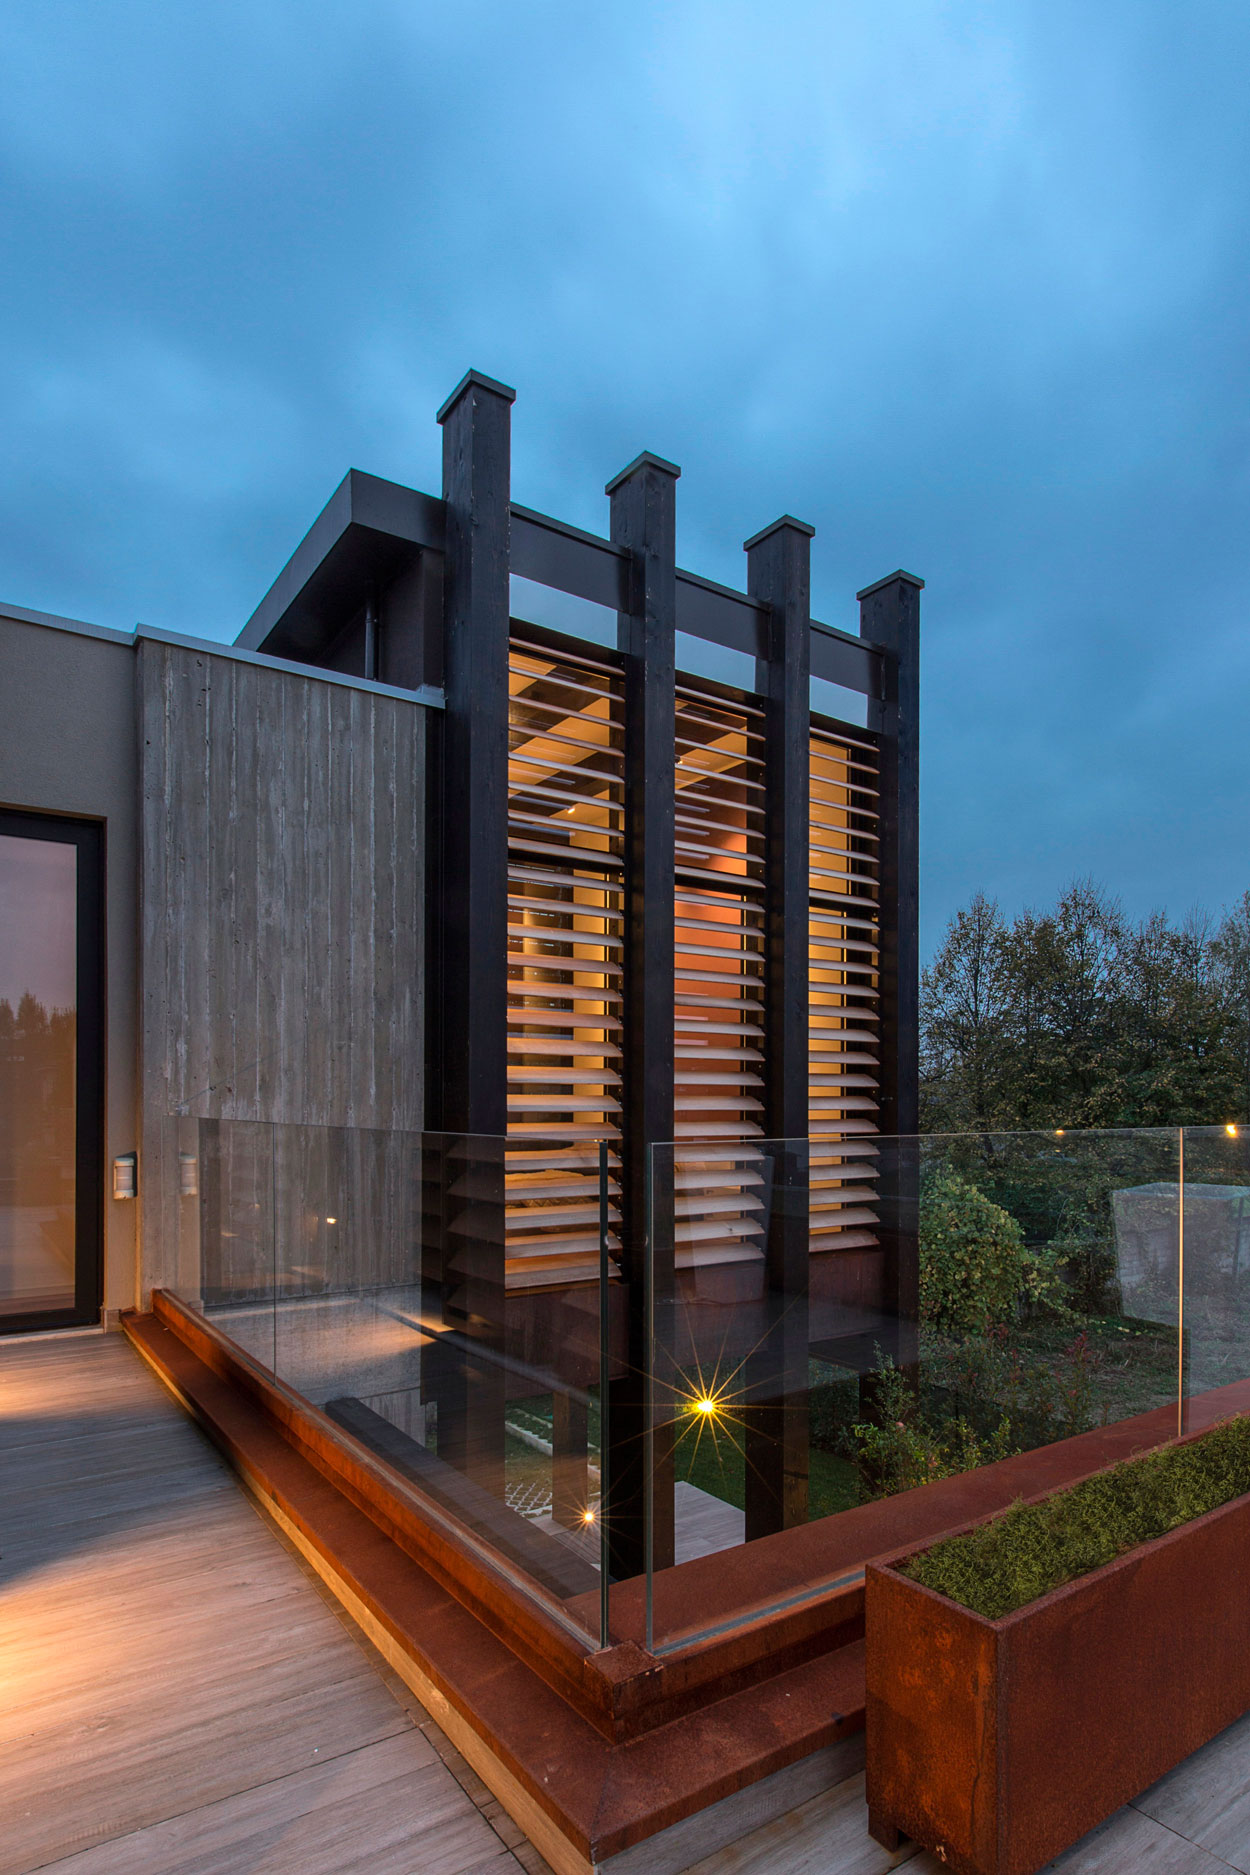 D'Autore Residence near Bologna by Giraldi Associati Architetti-47